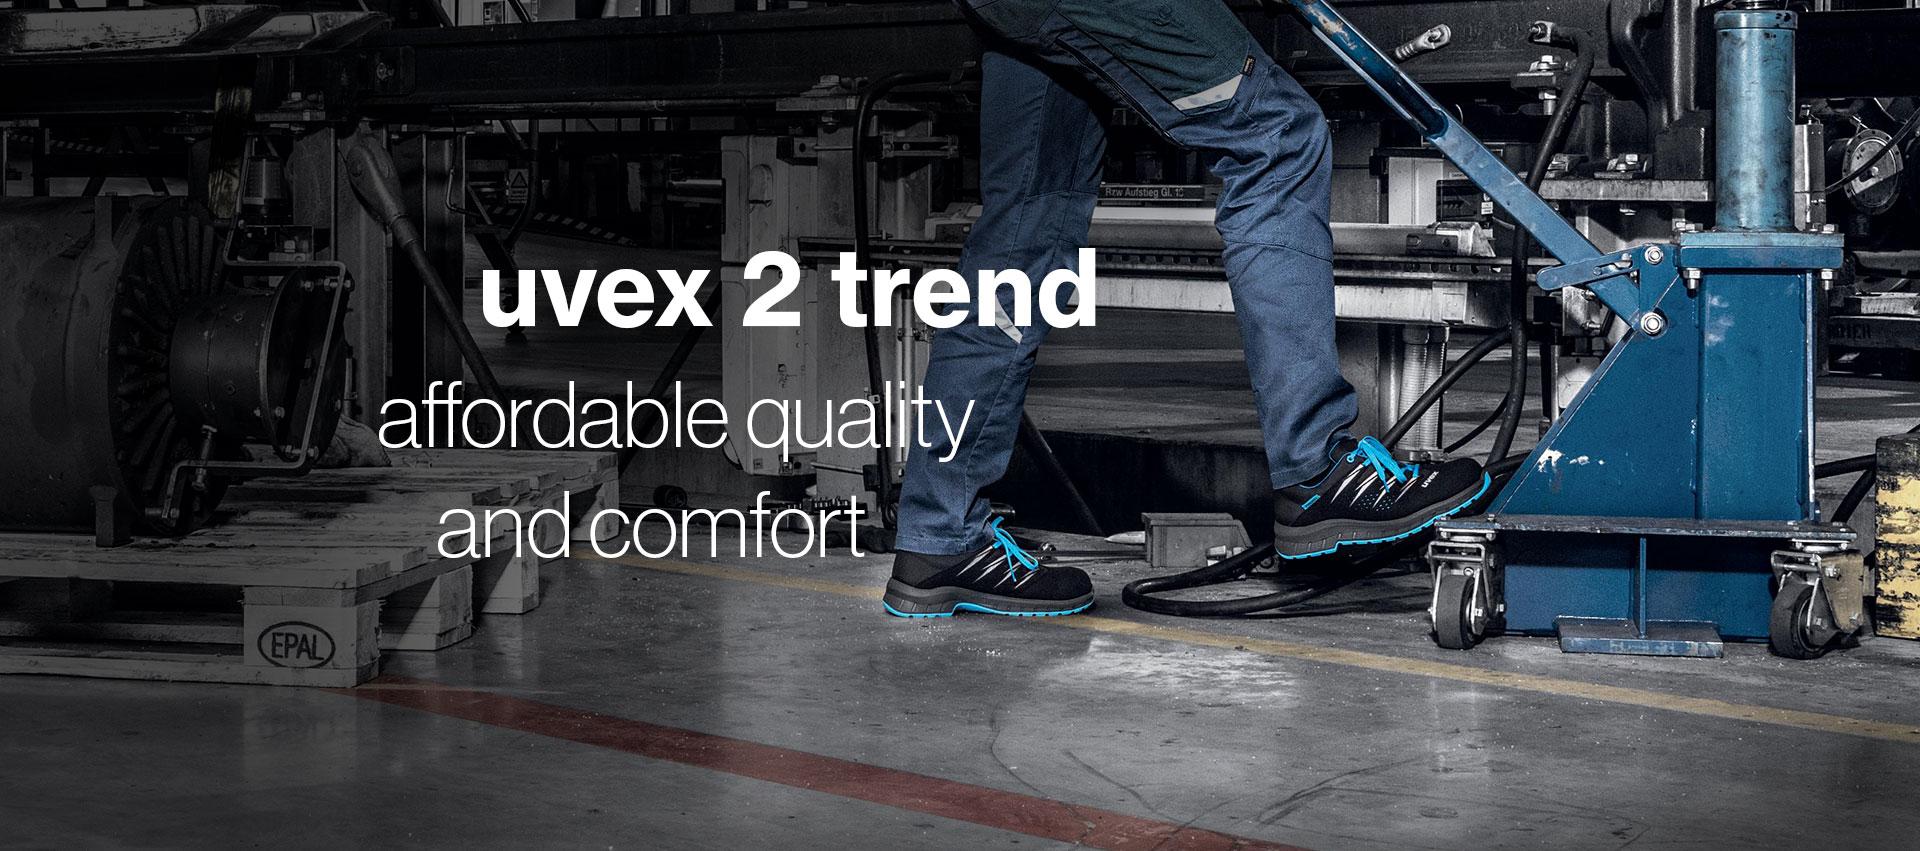 uvex 2 trend safety footwear